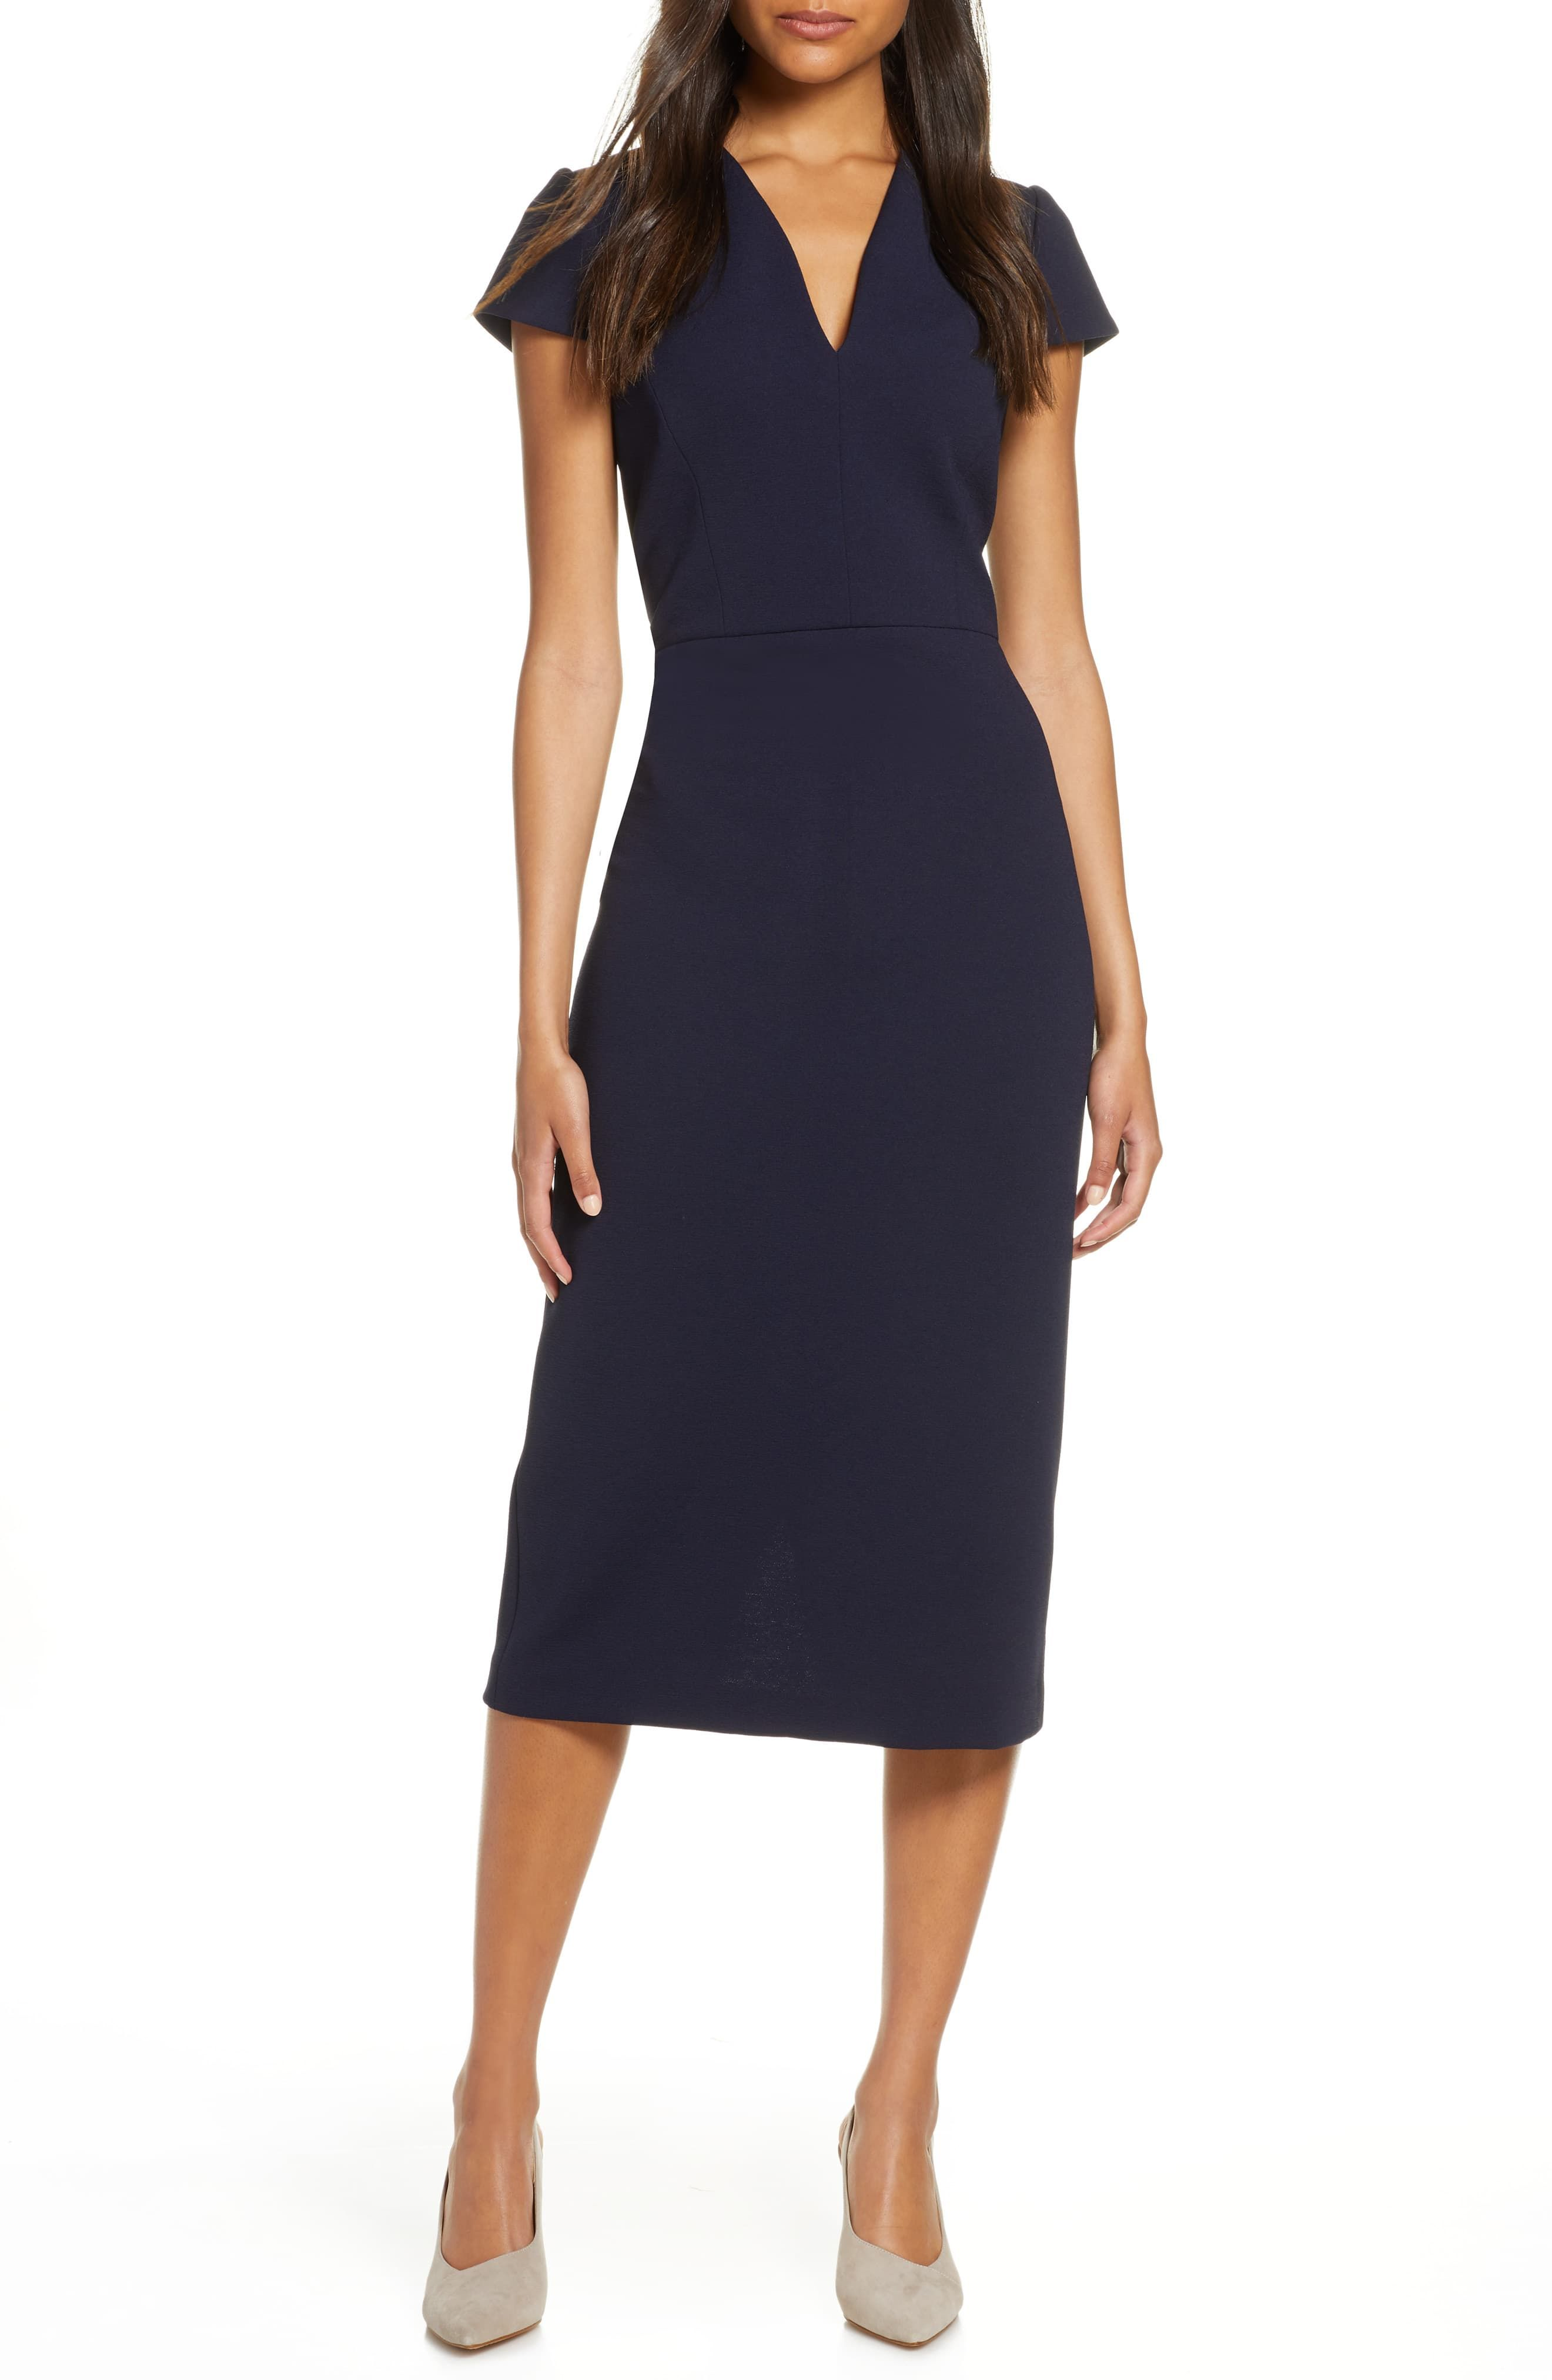 [+] Nordstrom Maggy London Dresses